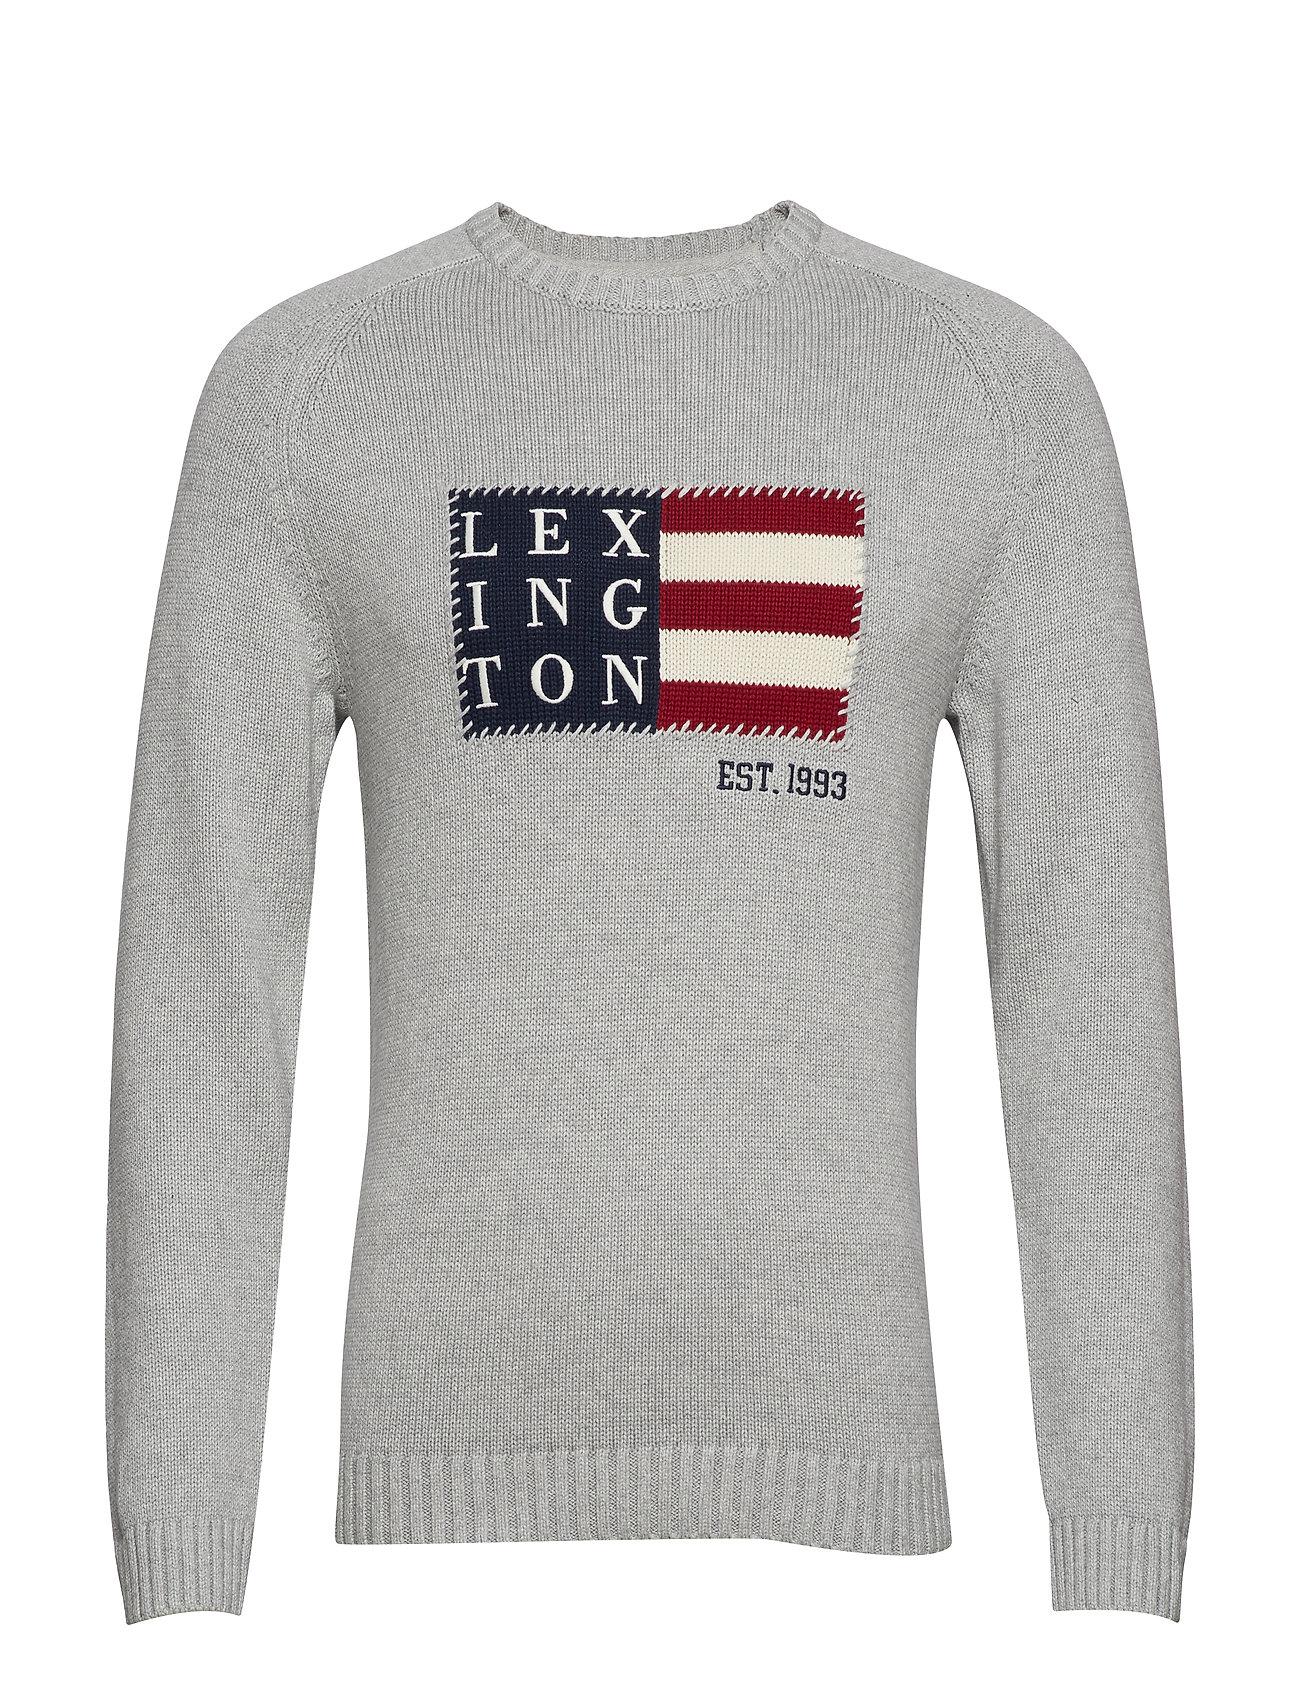 Lexington Clothing Dylan Sweater - GRAY MELANGE